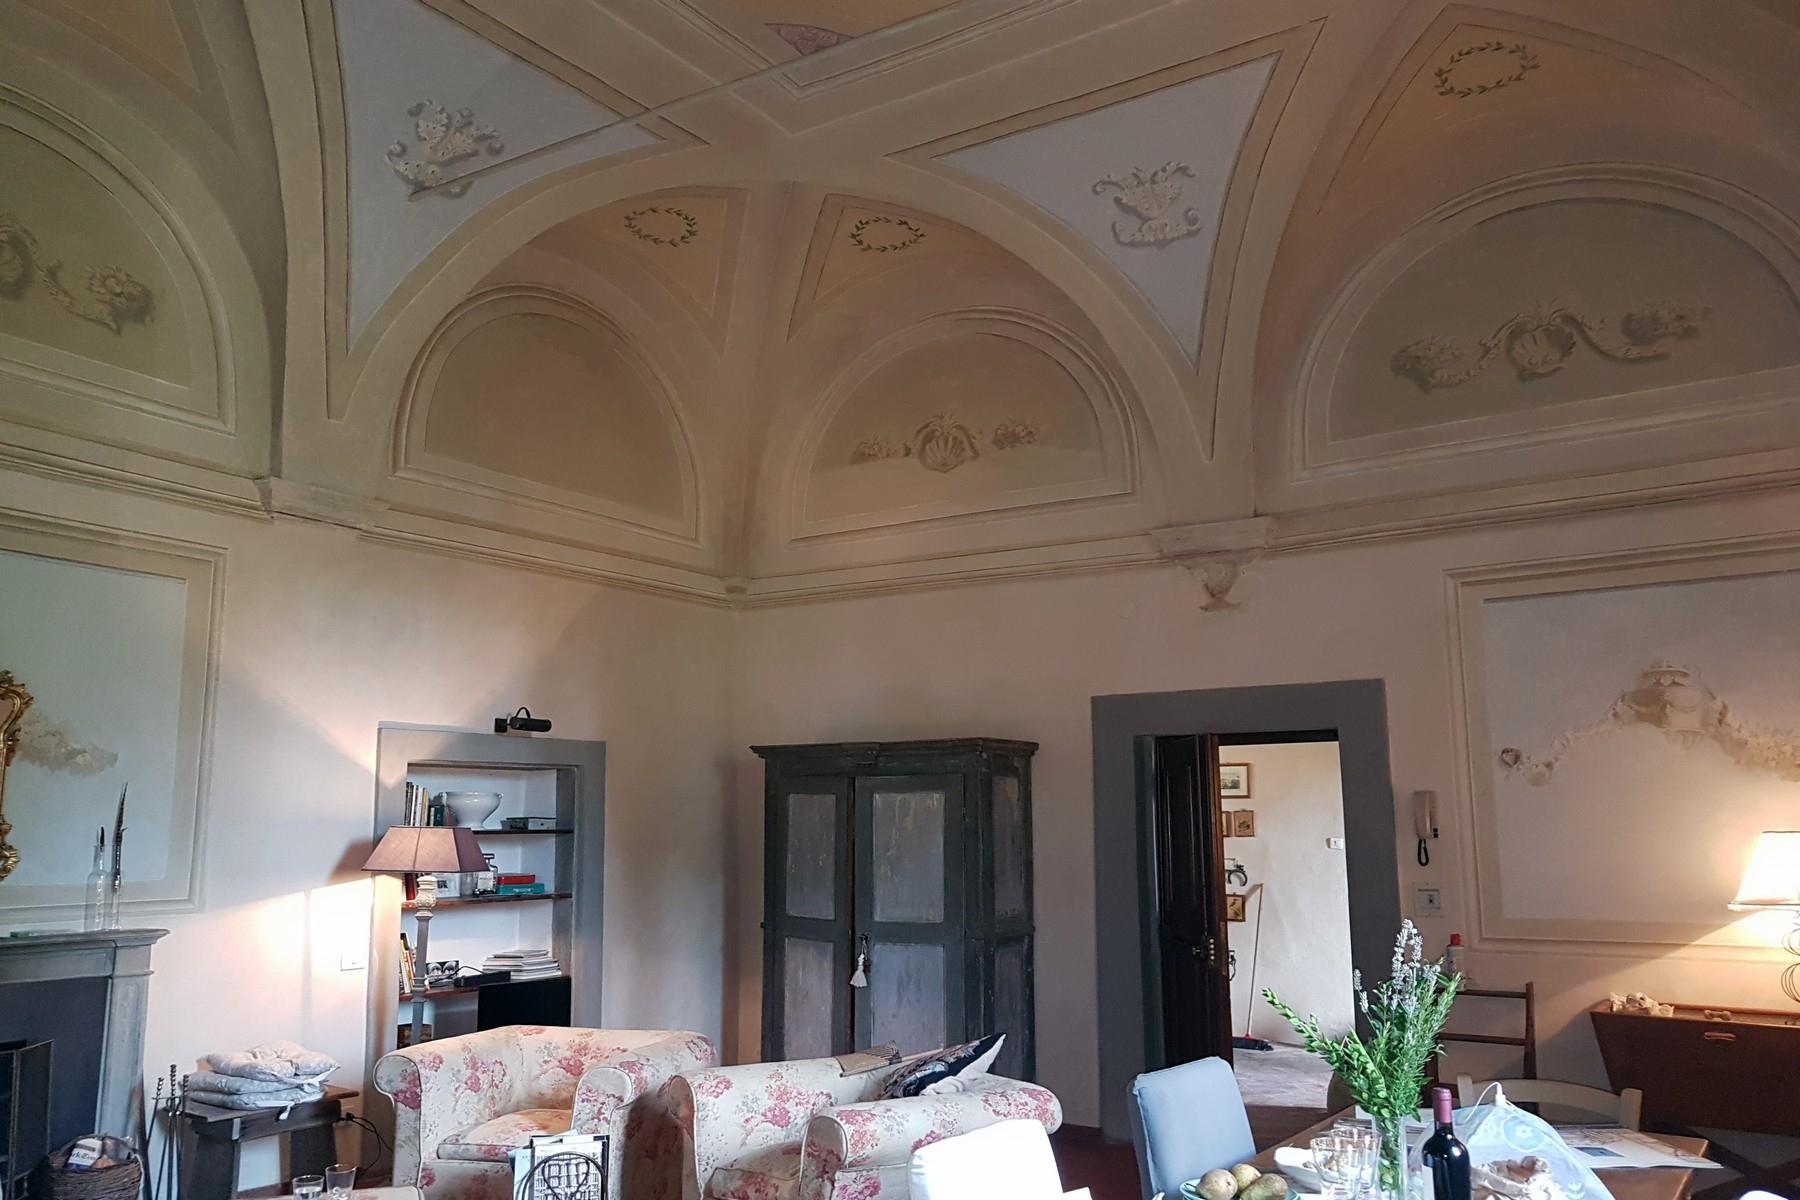 Appartamento in Vendita a San Casciano In Val Di Pesa: 4 locali, 85 mq - Foto 2